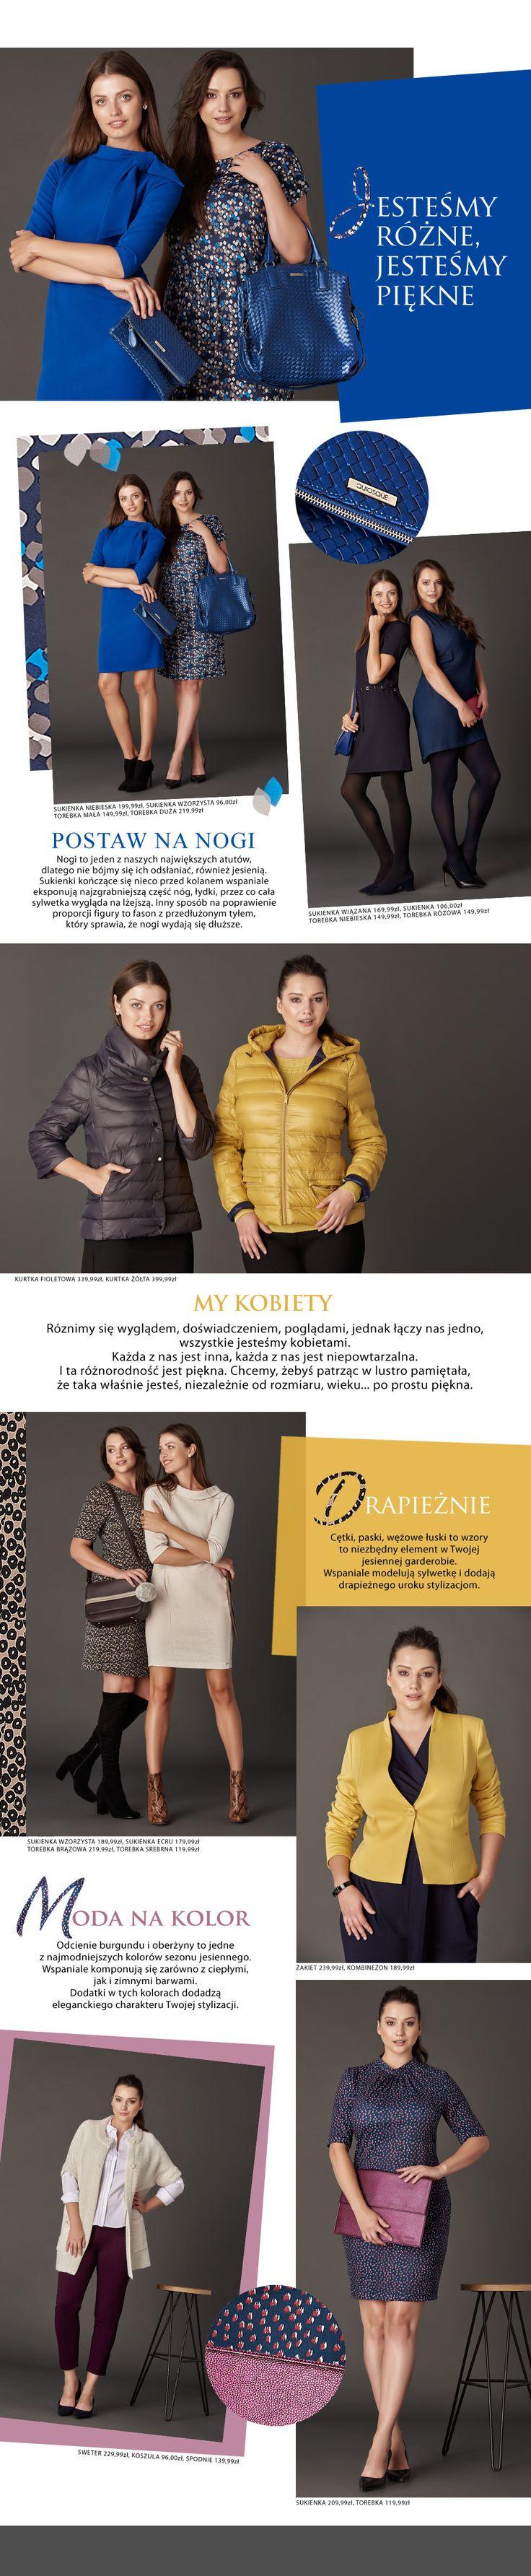 #quiosque #quiosquepl #naszainspiracja #skirt #bag #blouse #ootd #fashion #polishfashion #polishbrand #new #collection #aw1617 #jesien #zima #woman #lady #style #officestyle #outfit #ootd #feminine #kobieco #womanwear #trends #inspirations #fashion #polishfashion #polishbrand